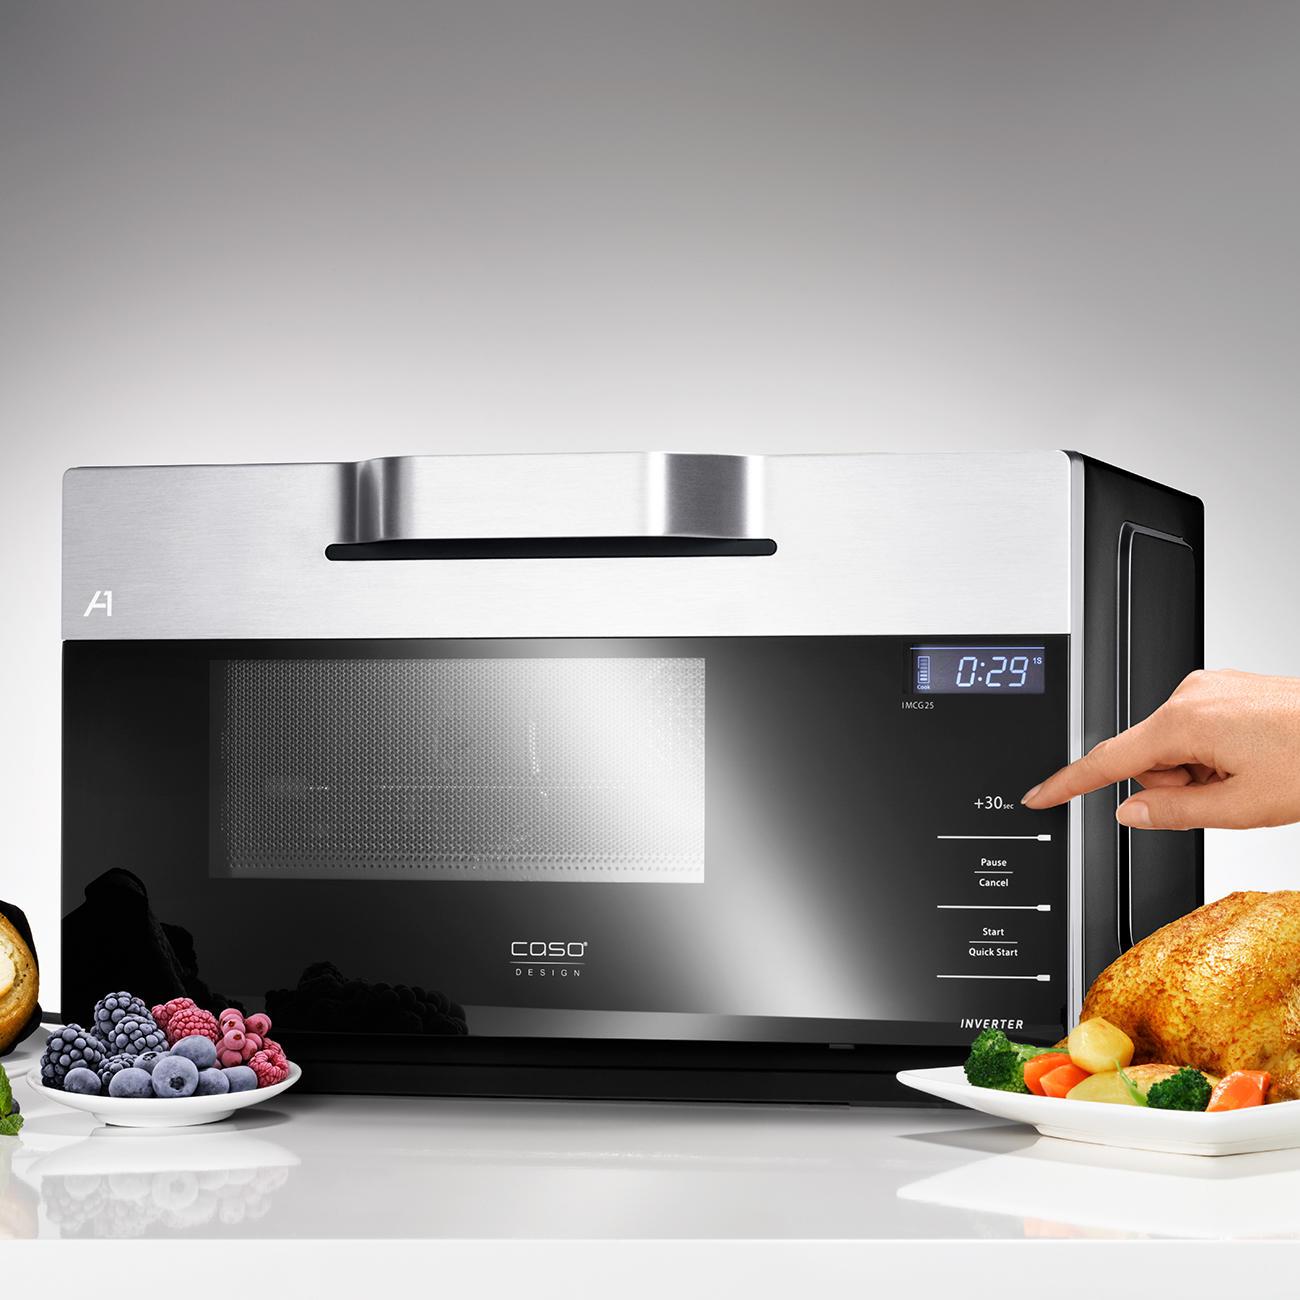 Micro ondes combin technologie inverter imcg25 pas cher for Technologie cuisine